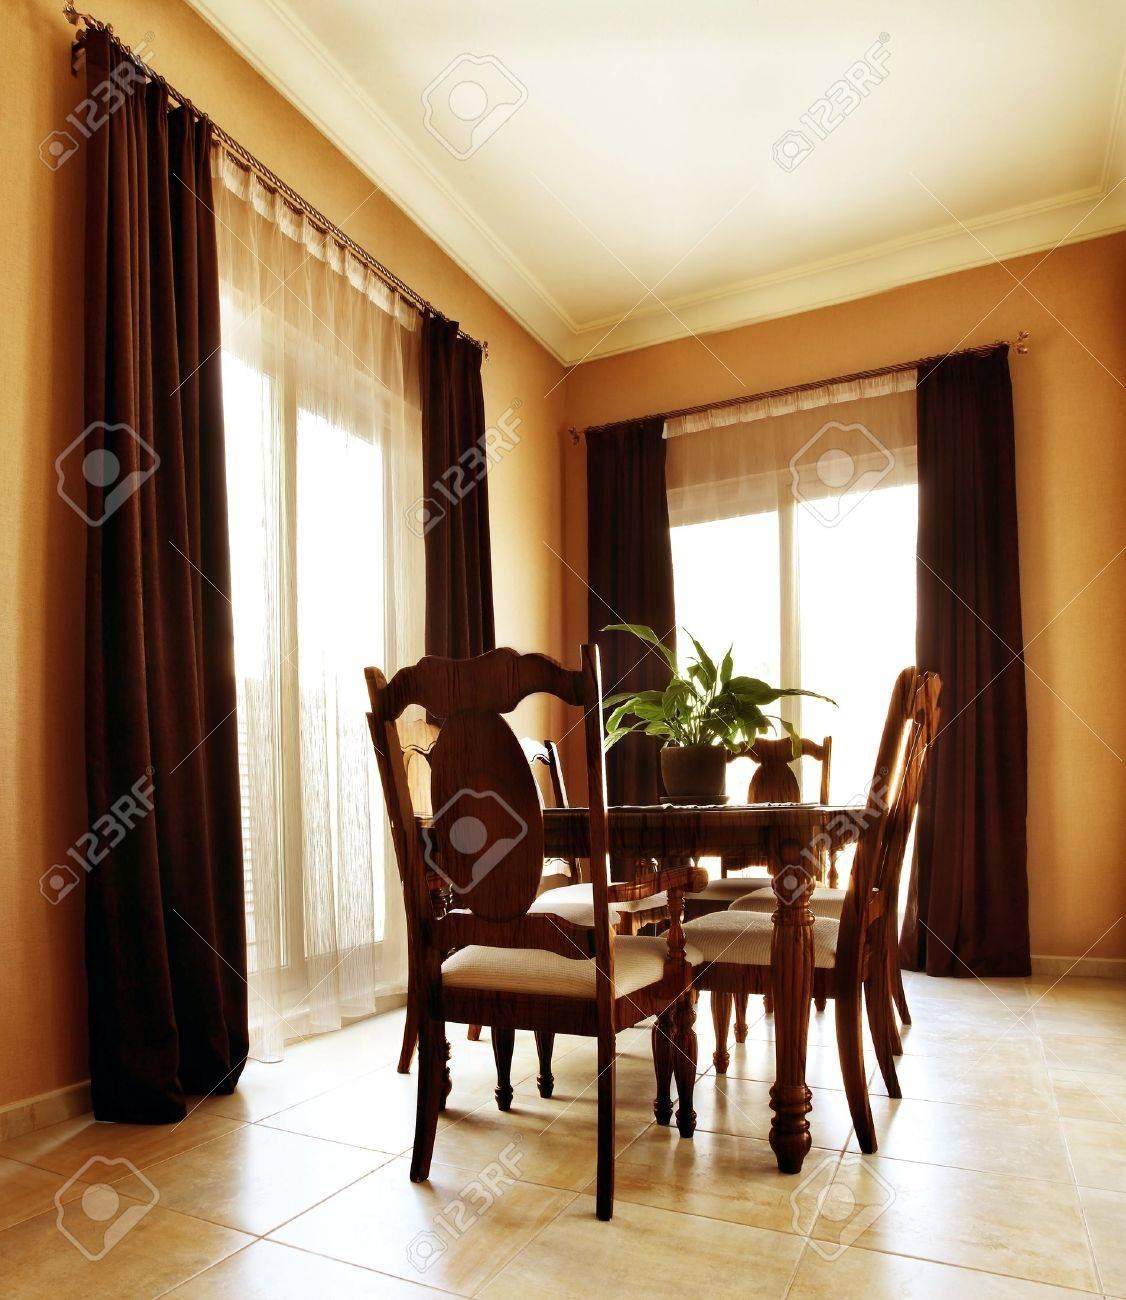 Luxury apartment with stylish modern interior design, dining room Stock Photo - 8638562